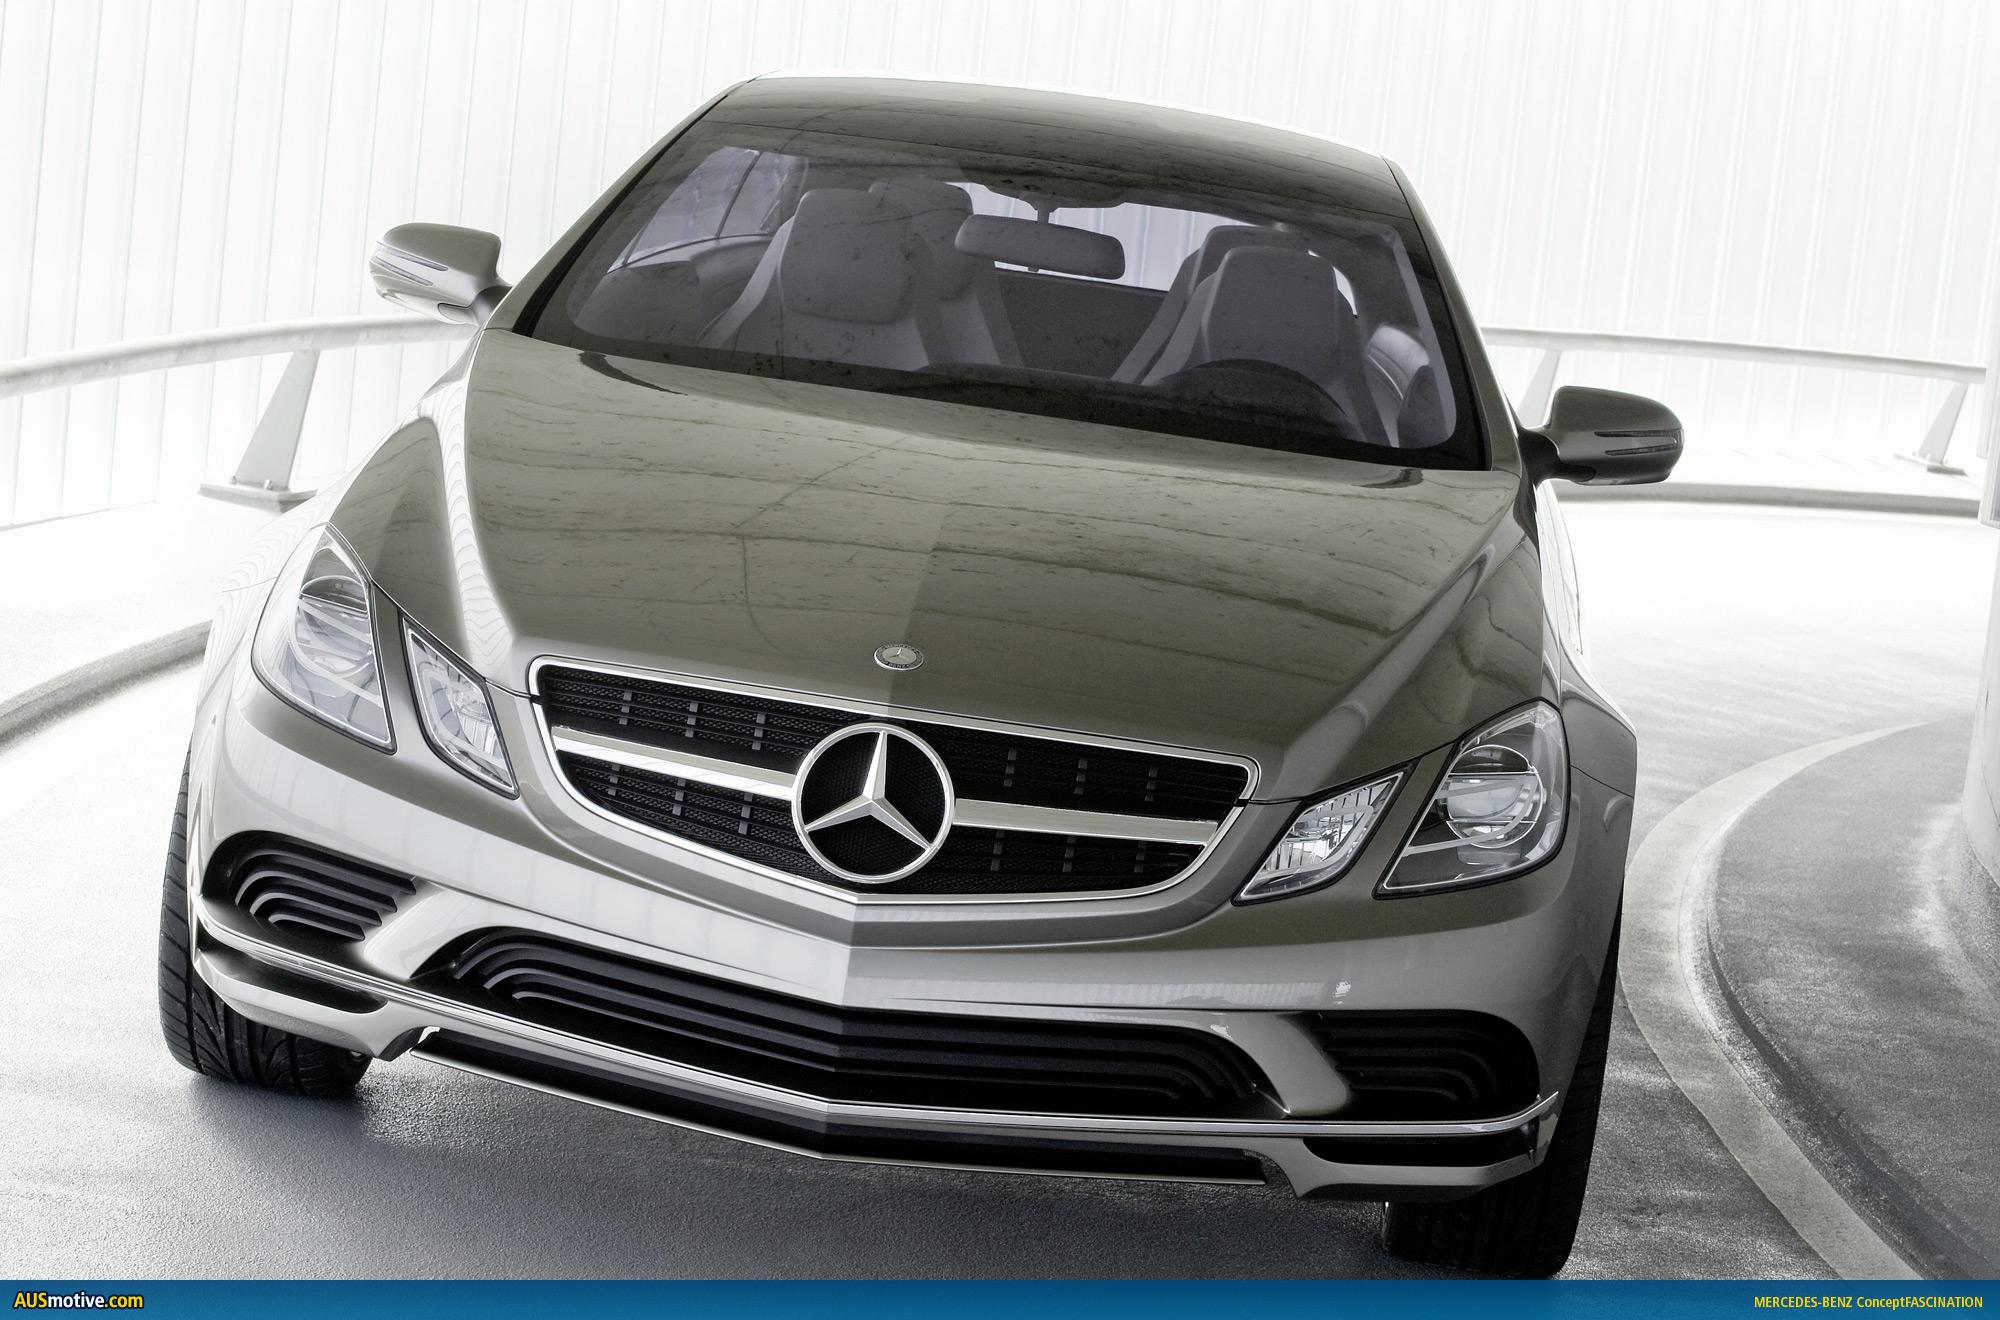 AUSmotive.com » CLS To Follow Estate Fascination